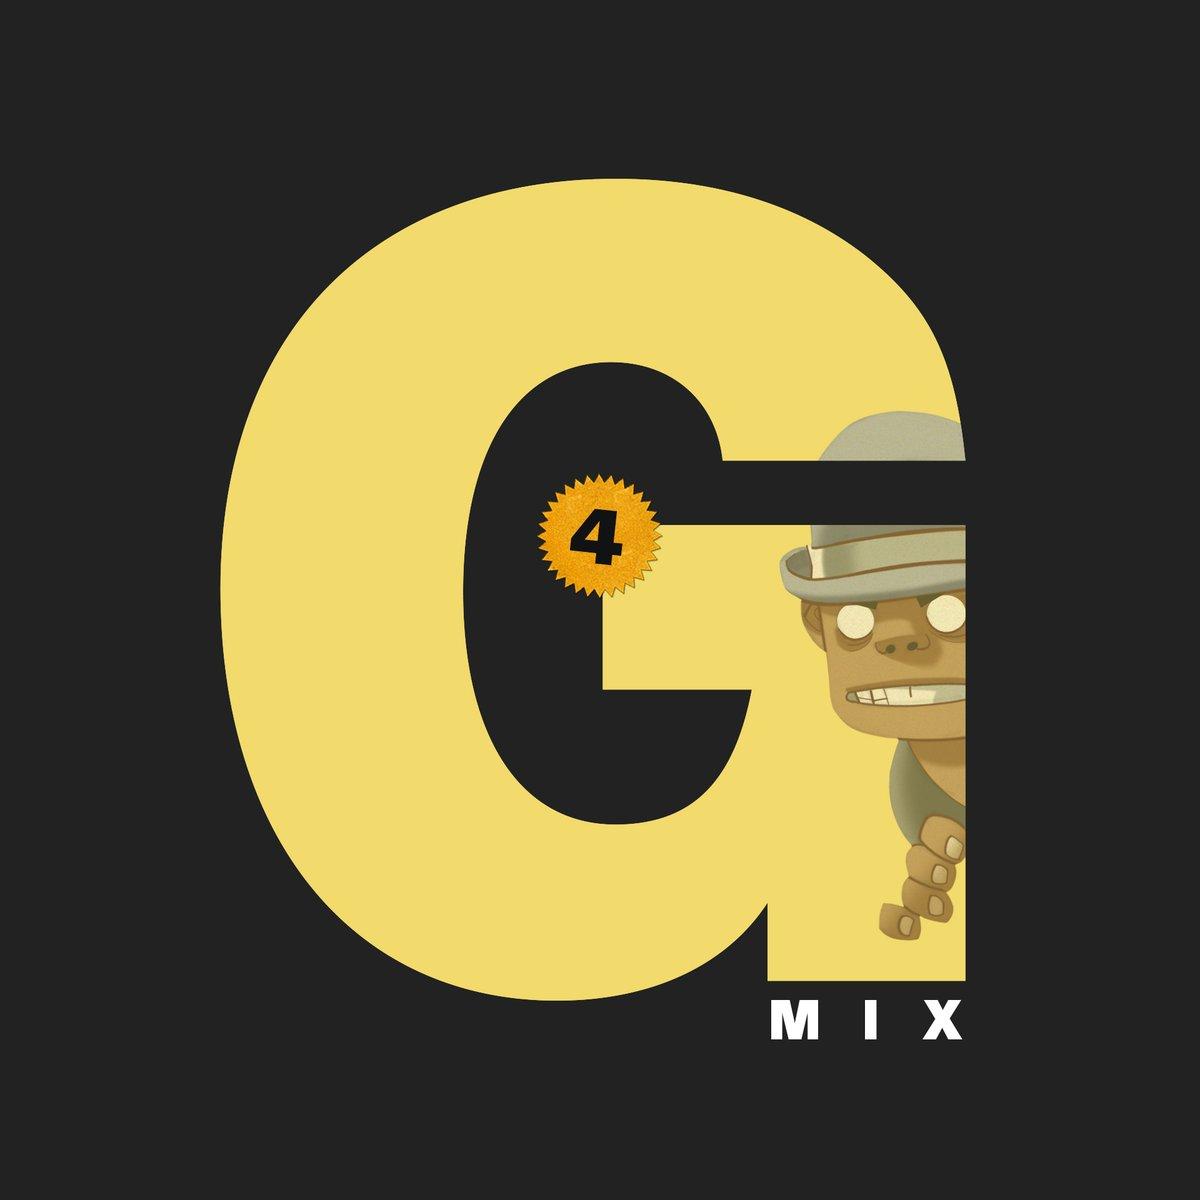 G-Mix: Russel 4